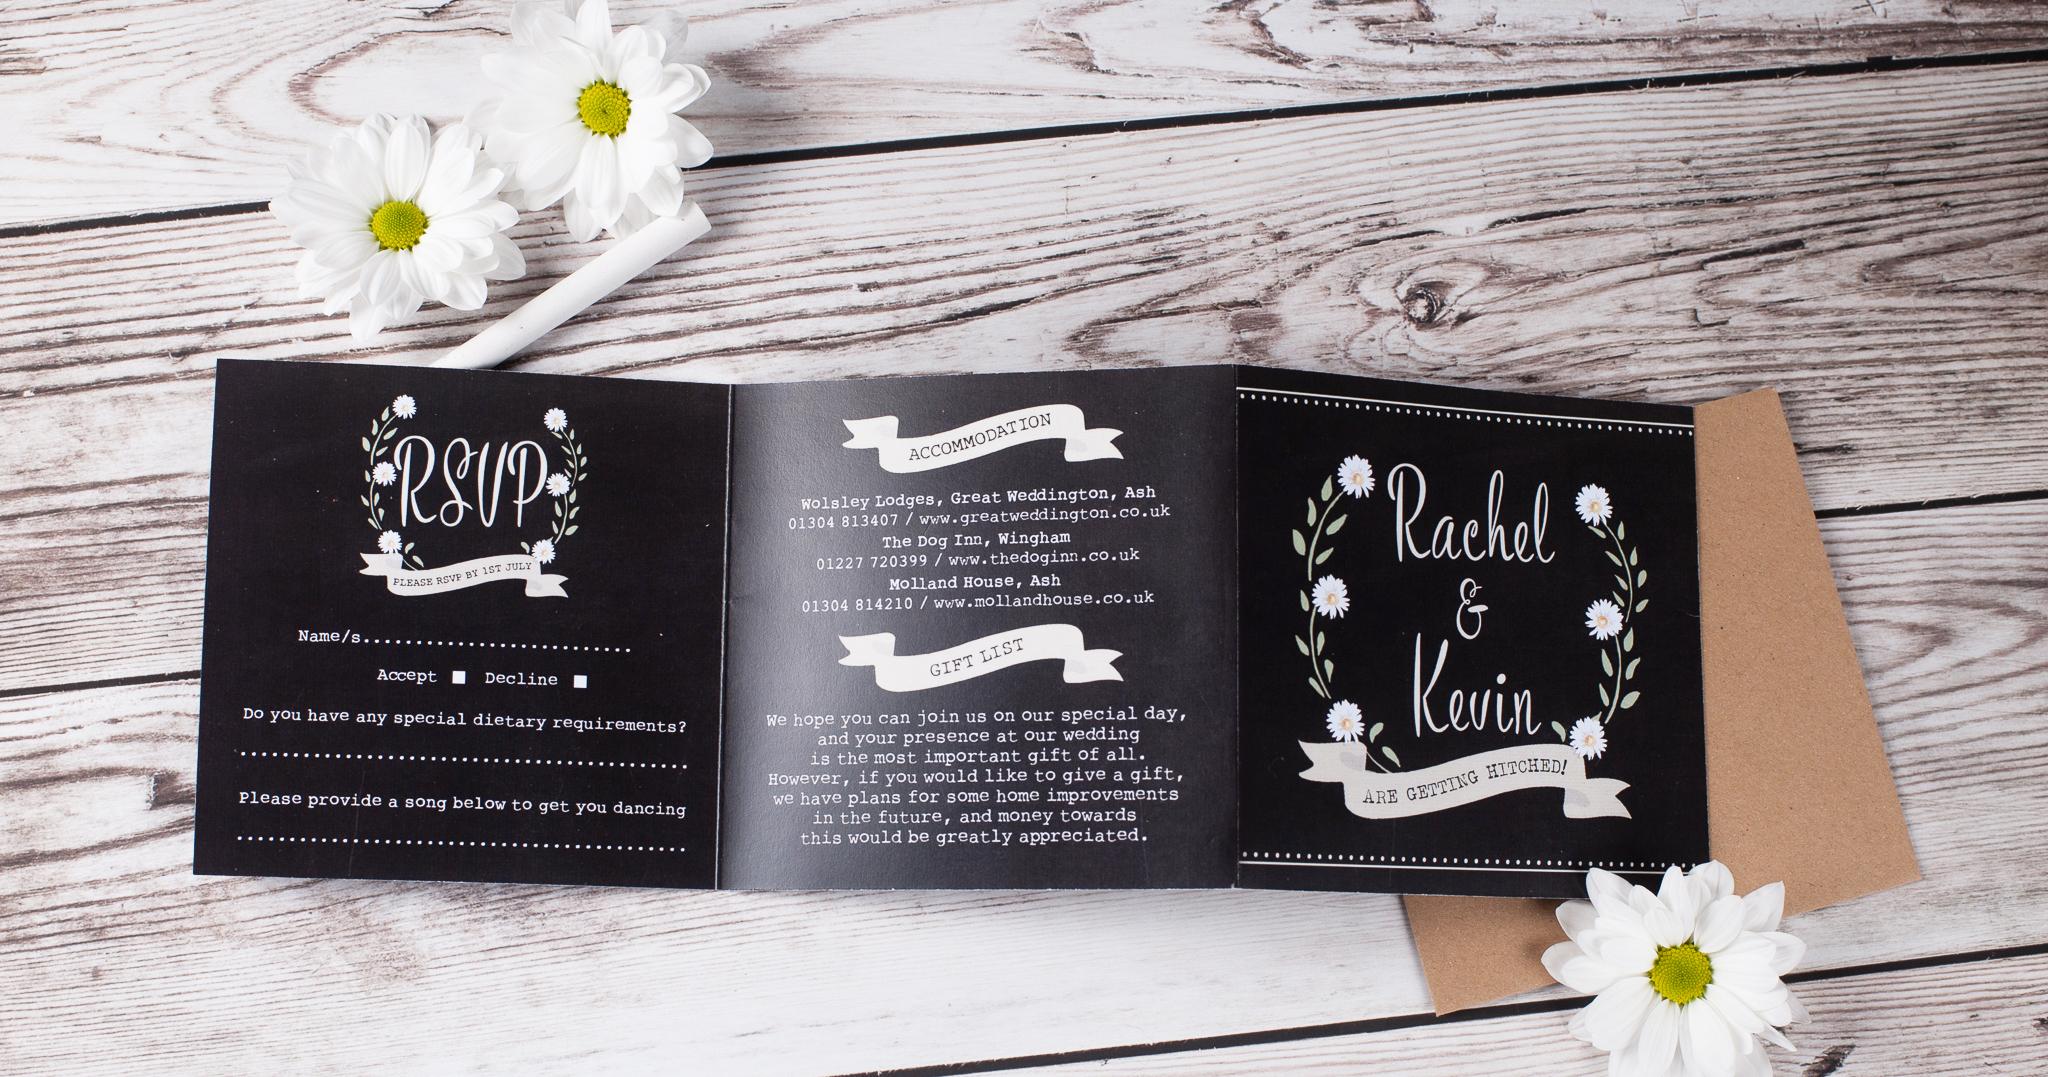 Wedding invite in a chalkboard / blackboard style with daisies